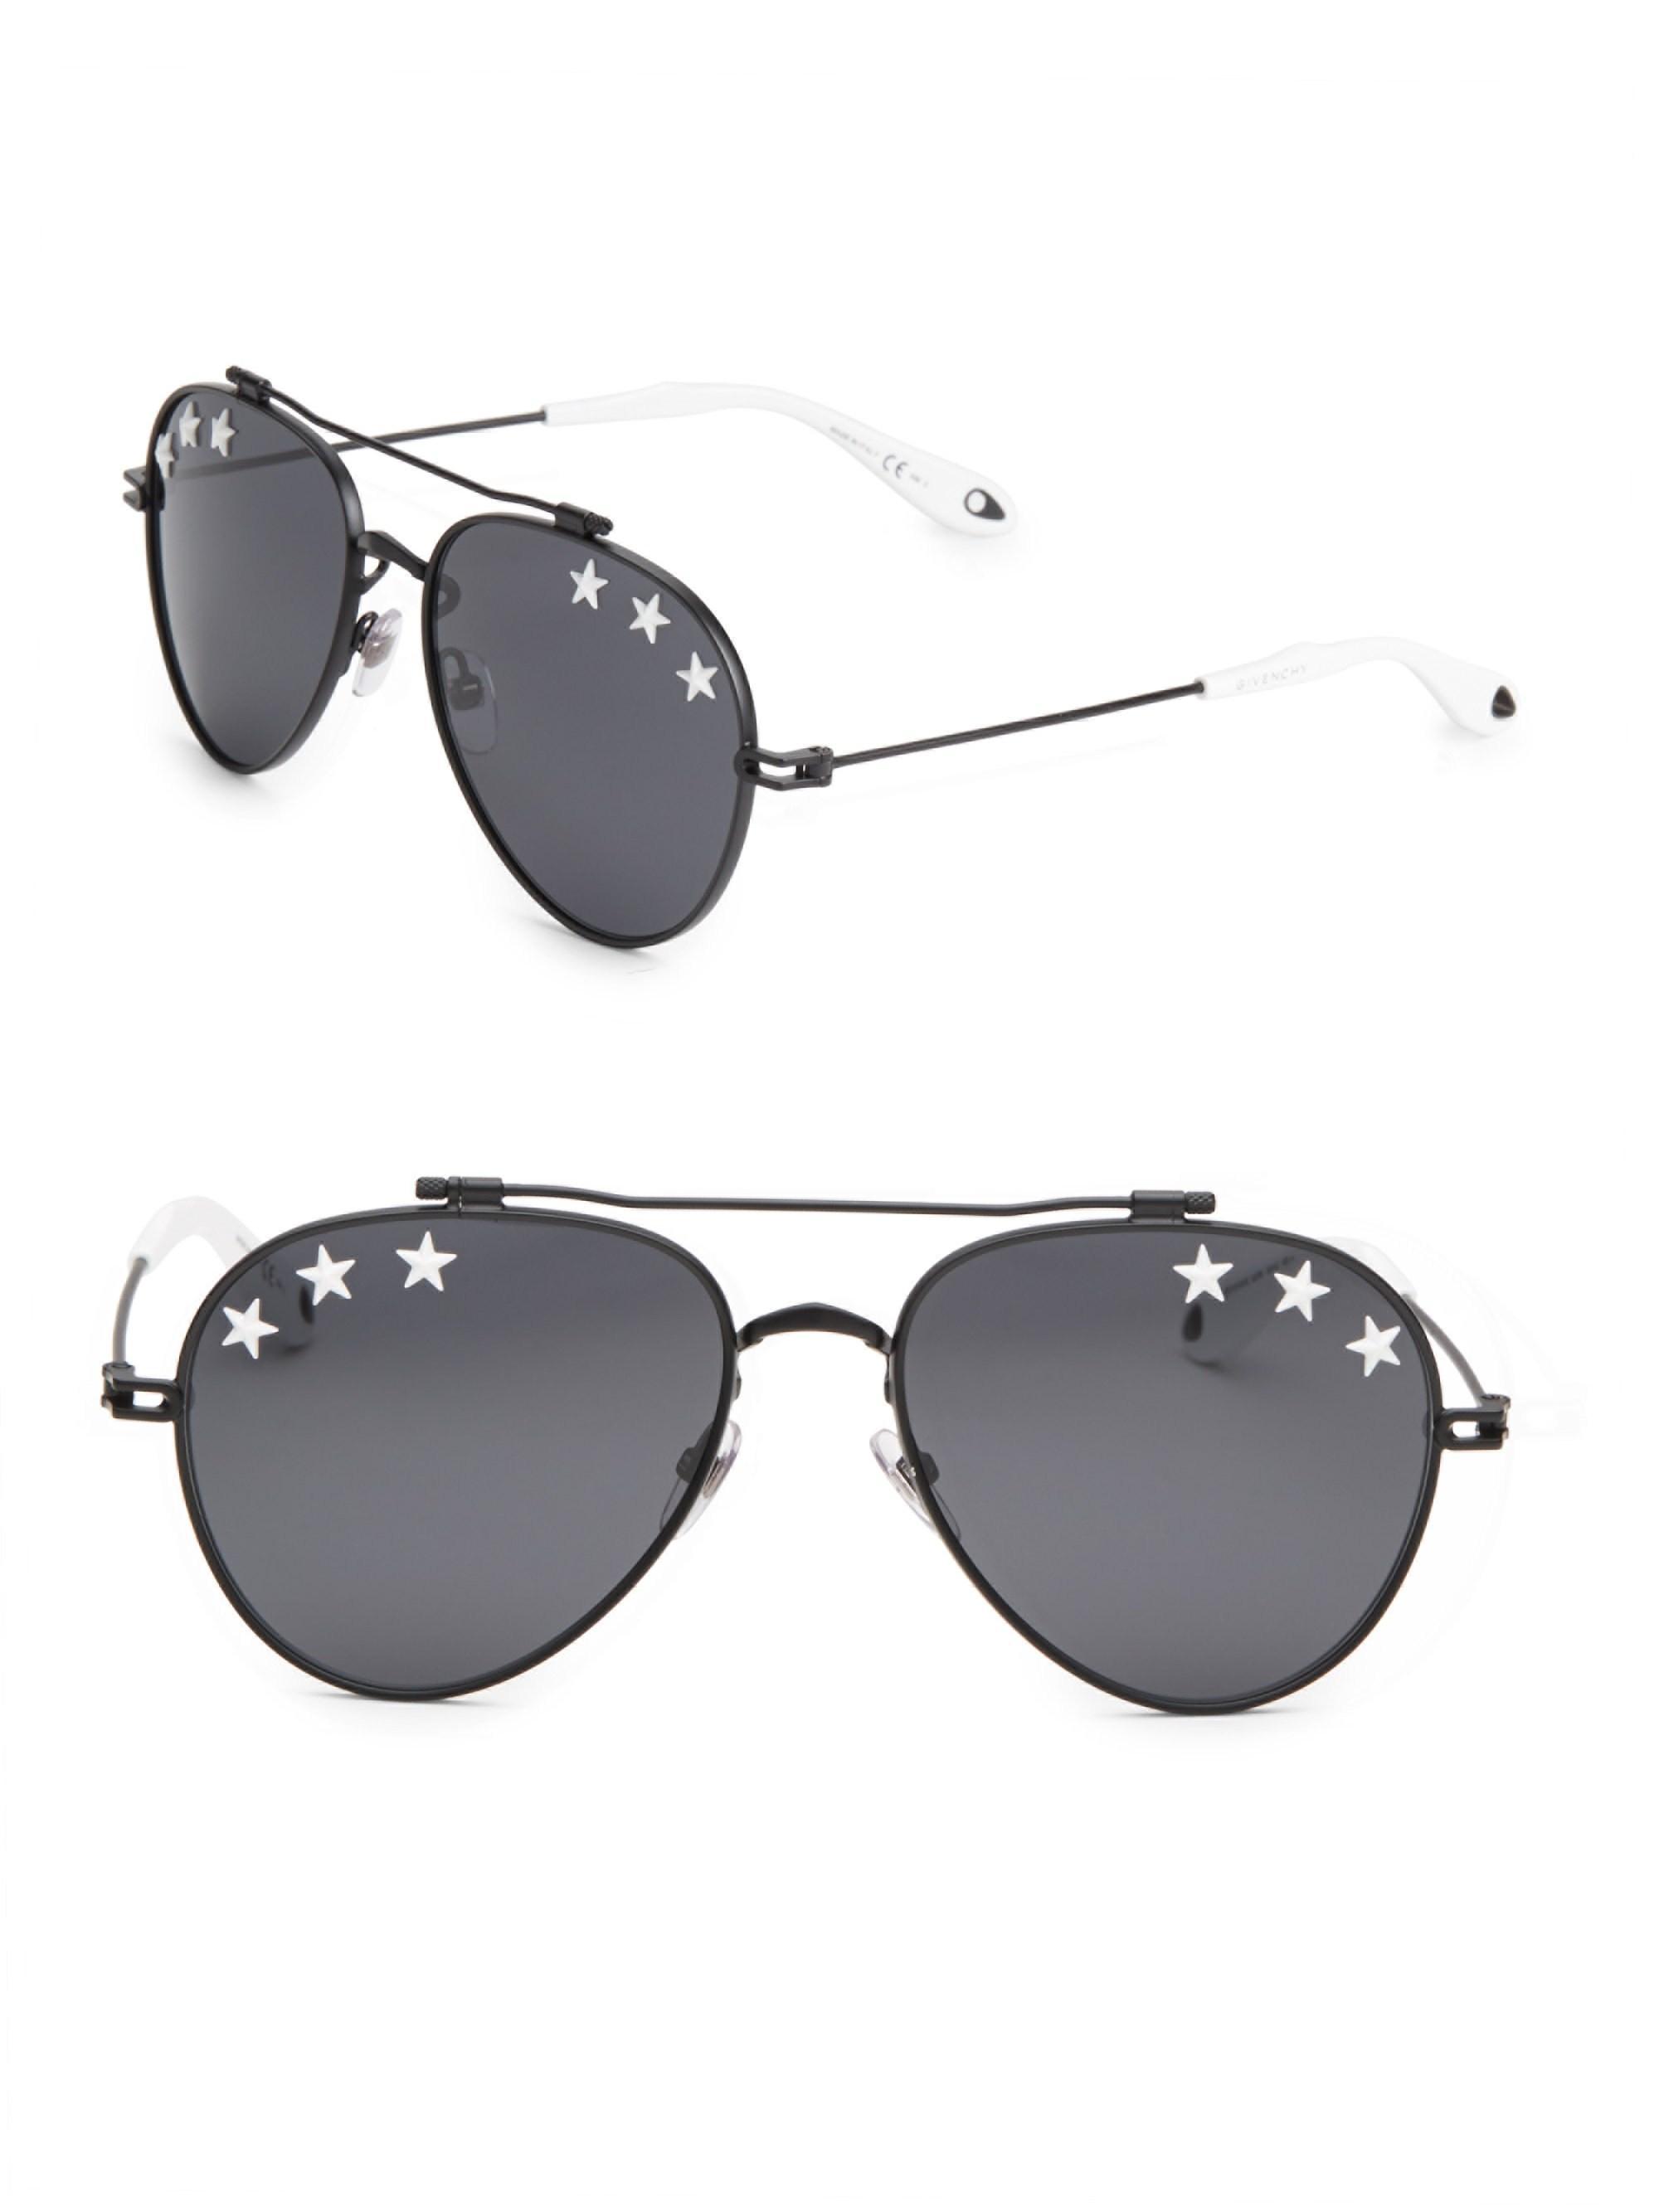 20ec8a13b57fa Givenchy 58mm Star Aviator Sunglasses for Men - Lyst